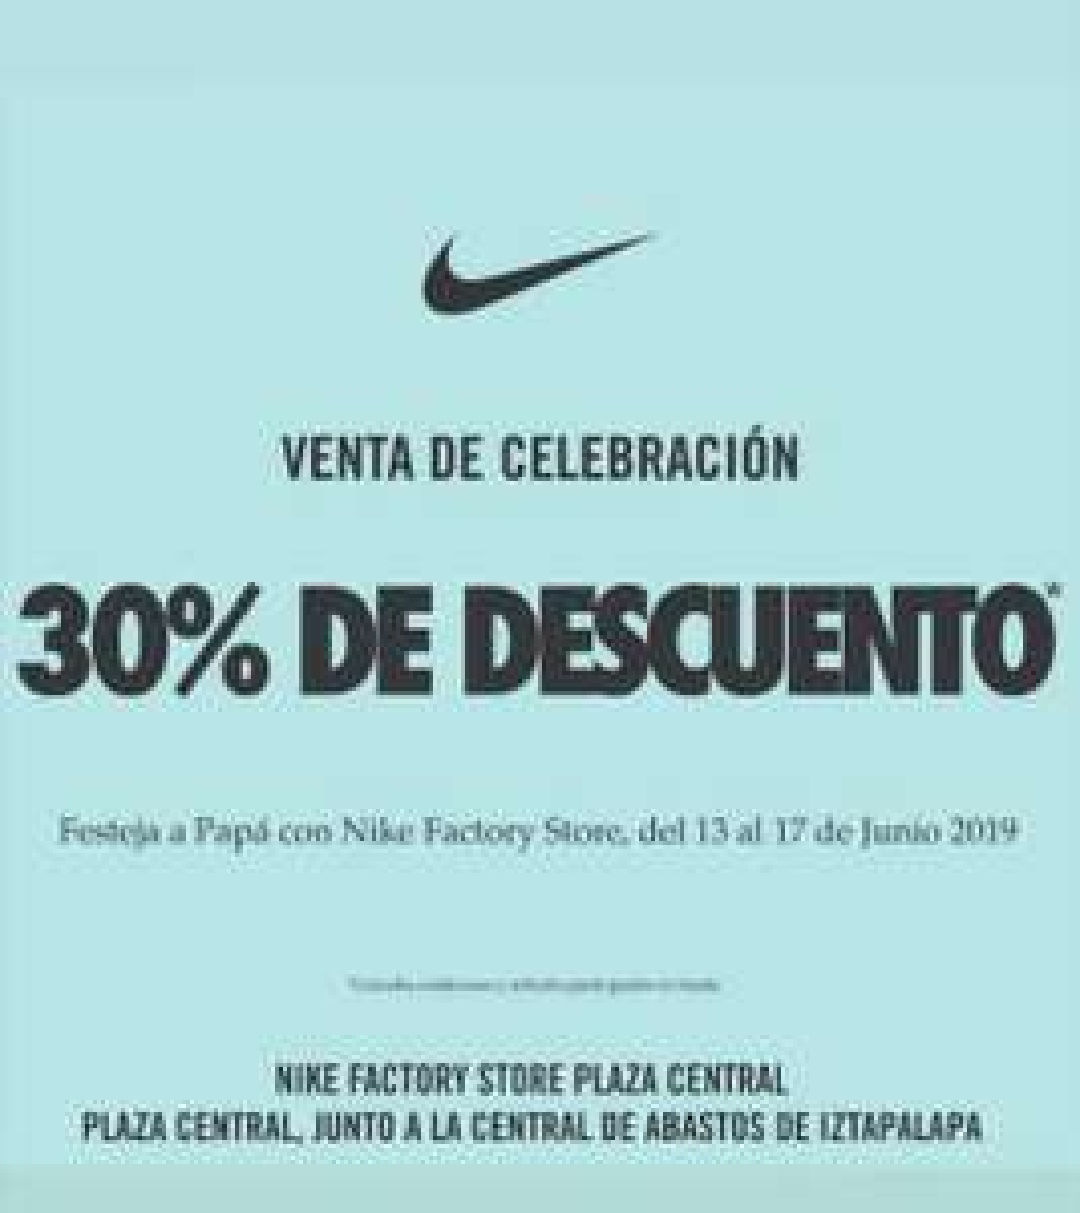 Nike factory 30% de descuento